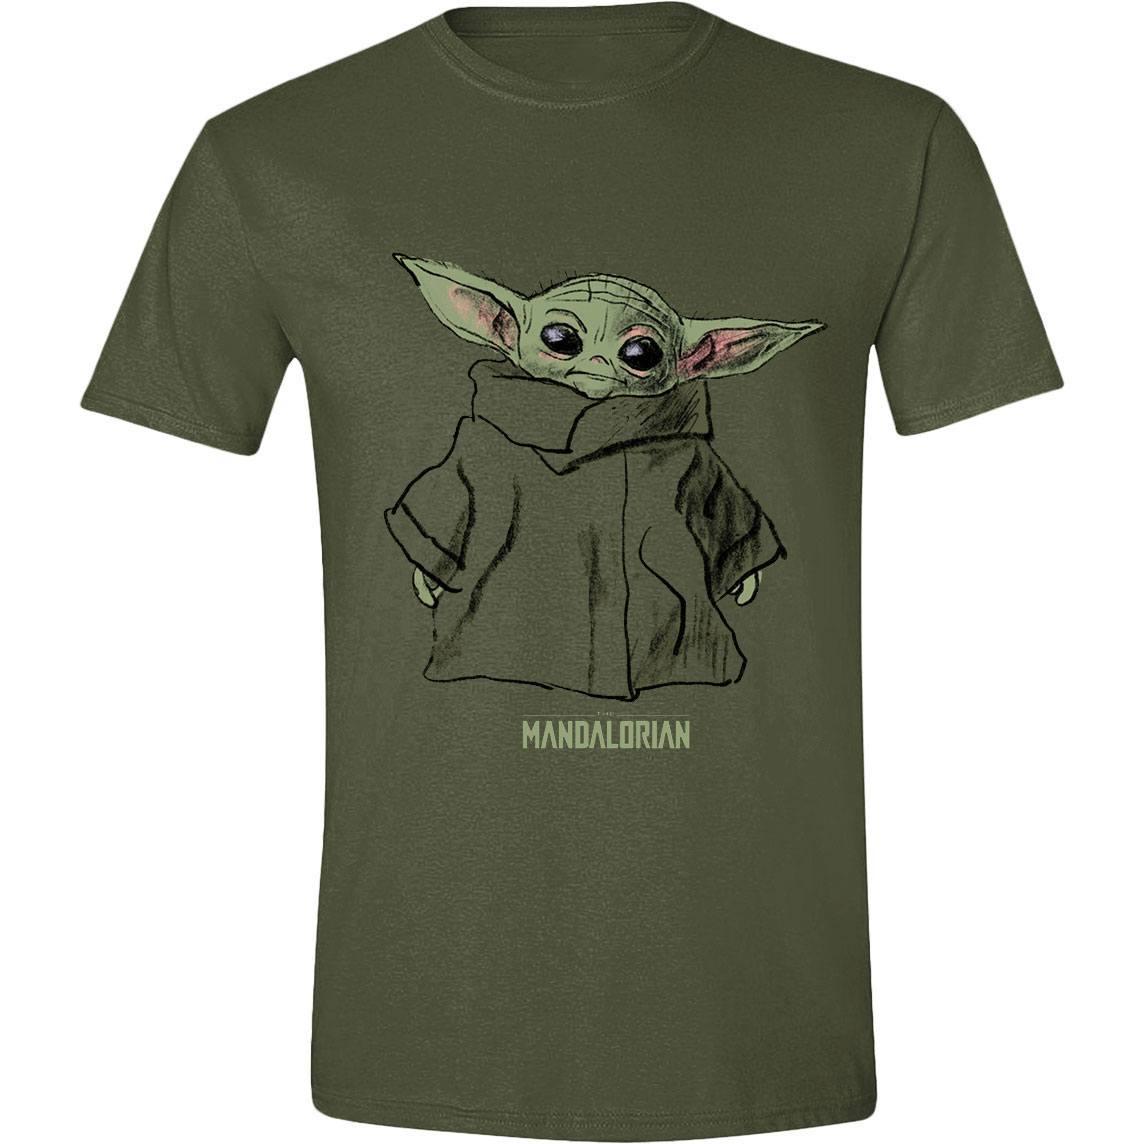 Star Wars The Mandalorian T-Shirt The Child Sketch Size XL